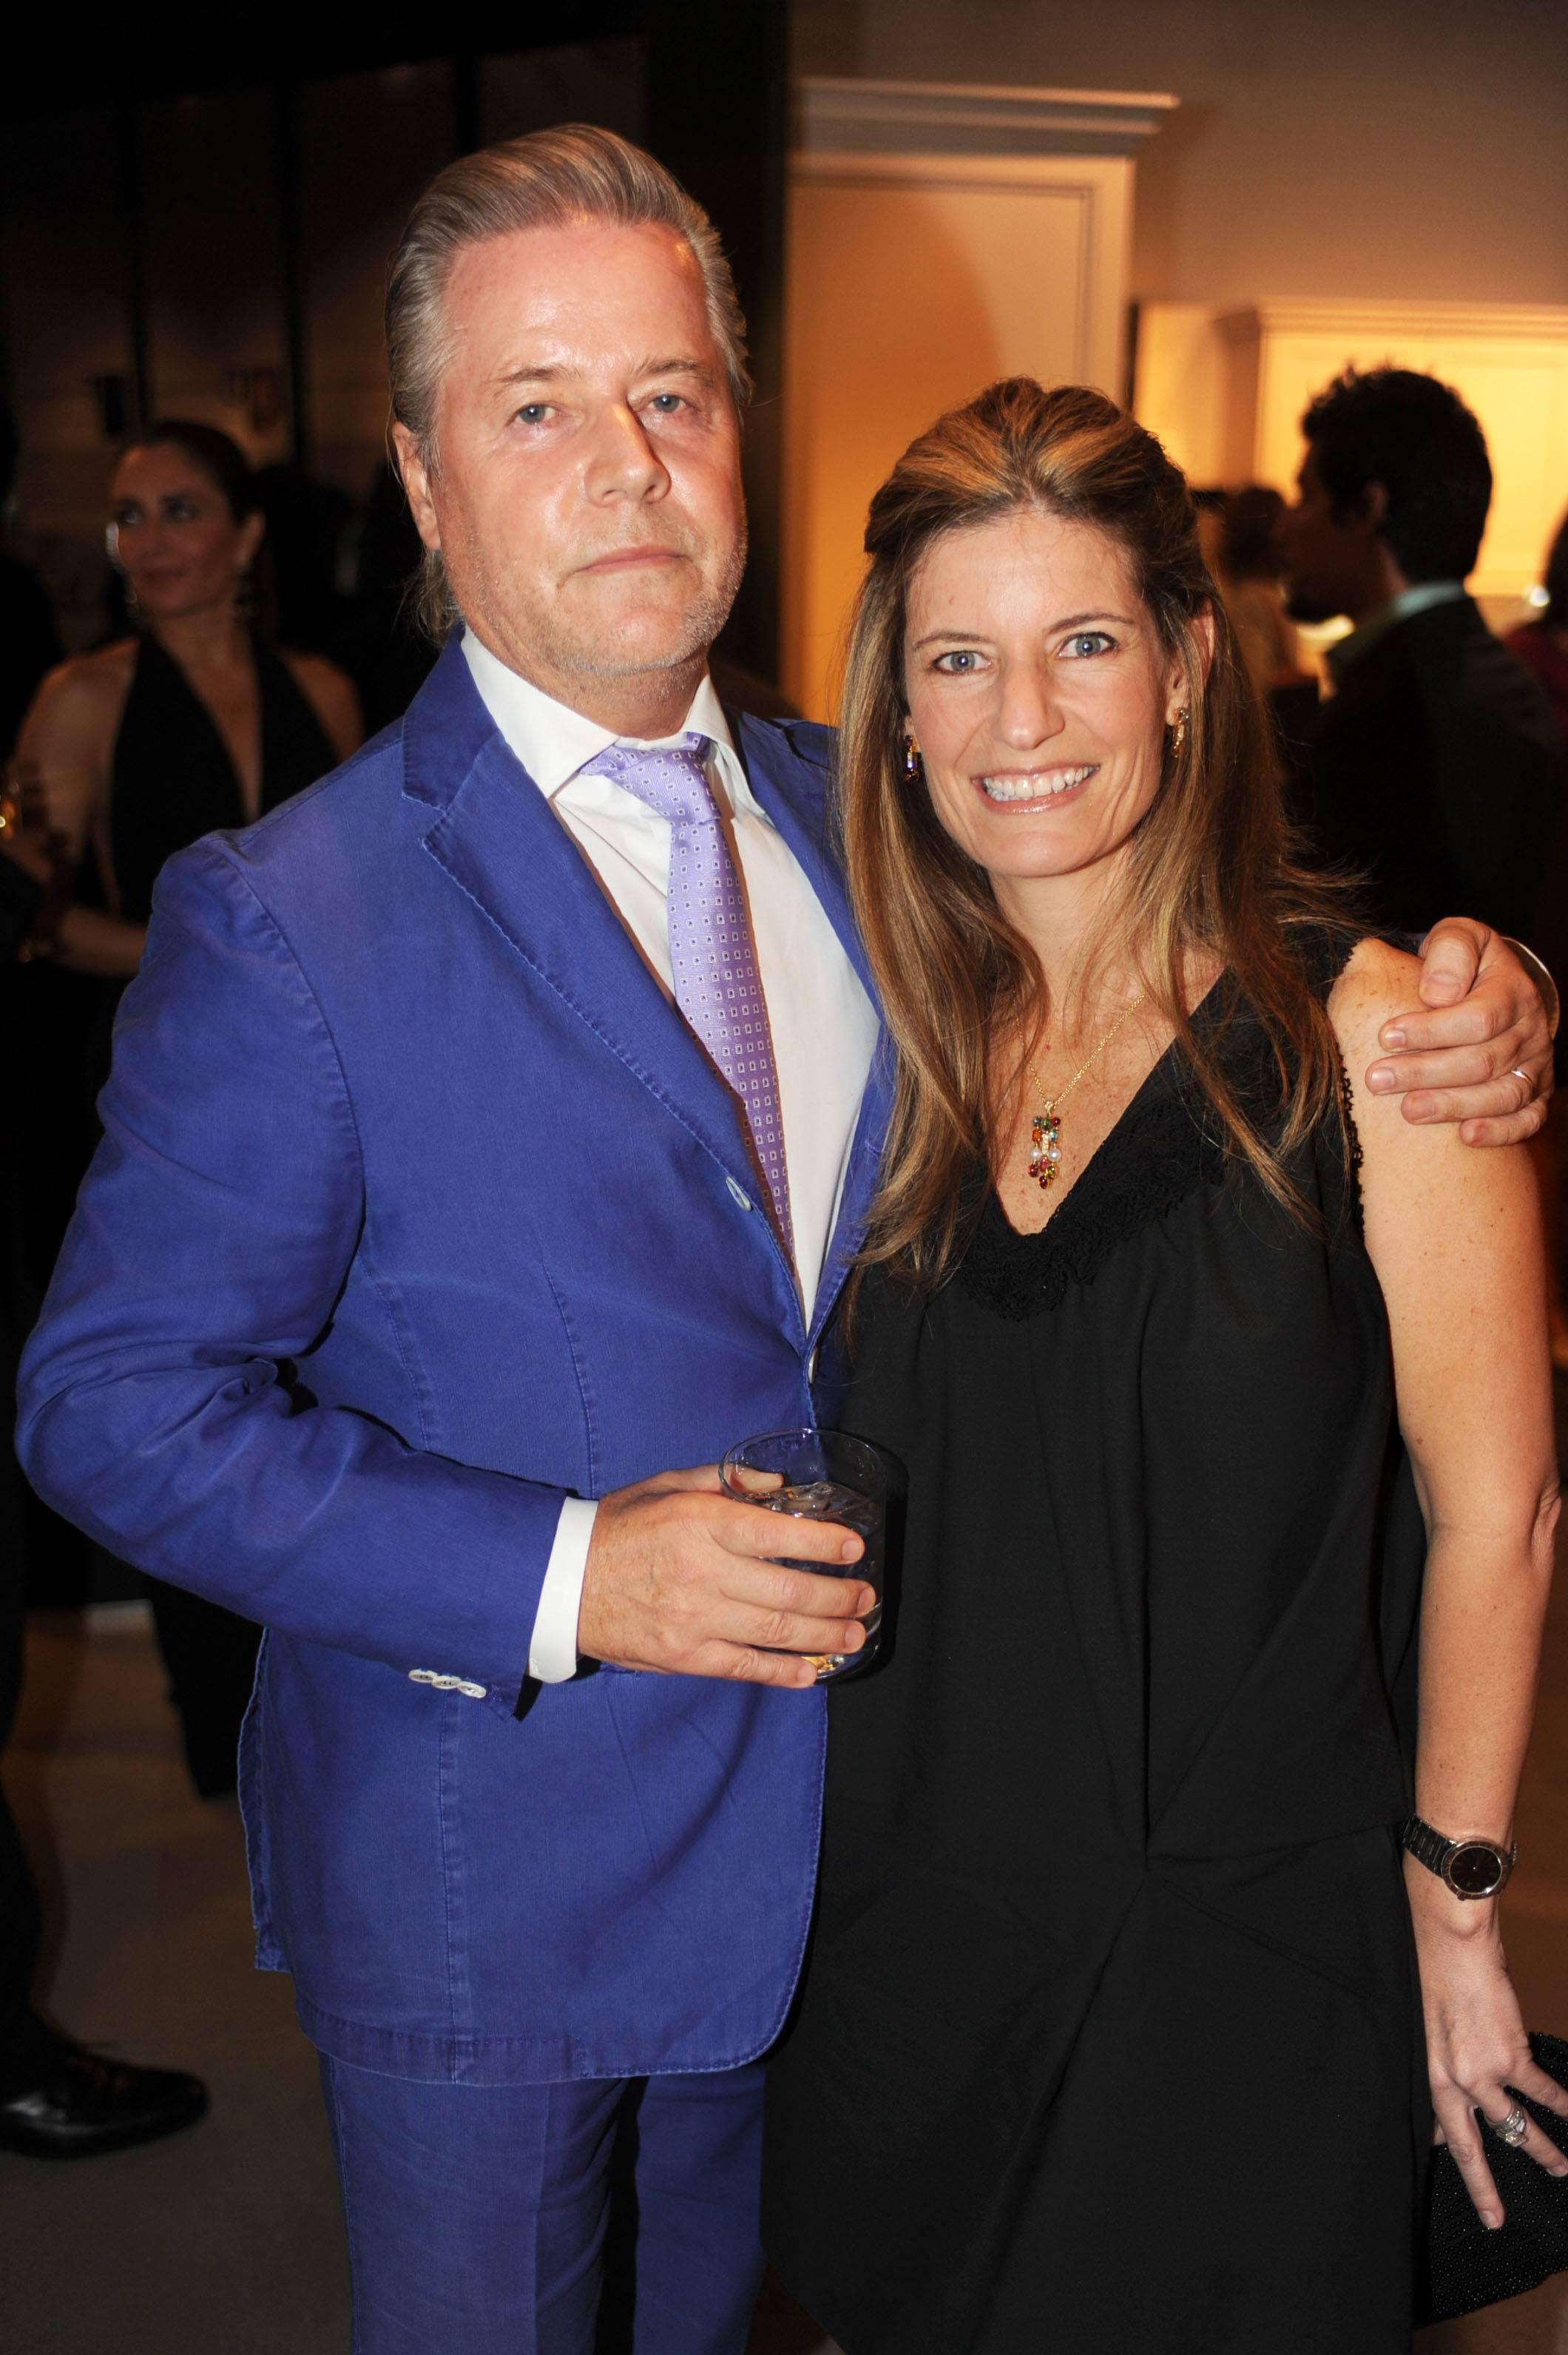 Ingemar Thylen & Deborah Wescelman